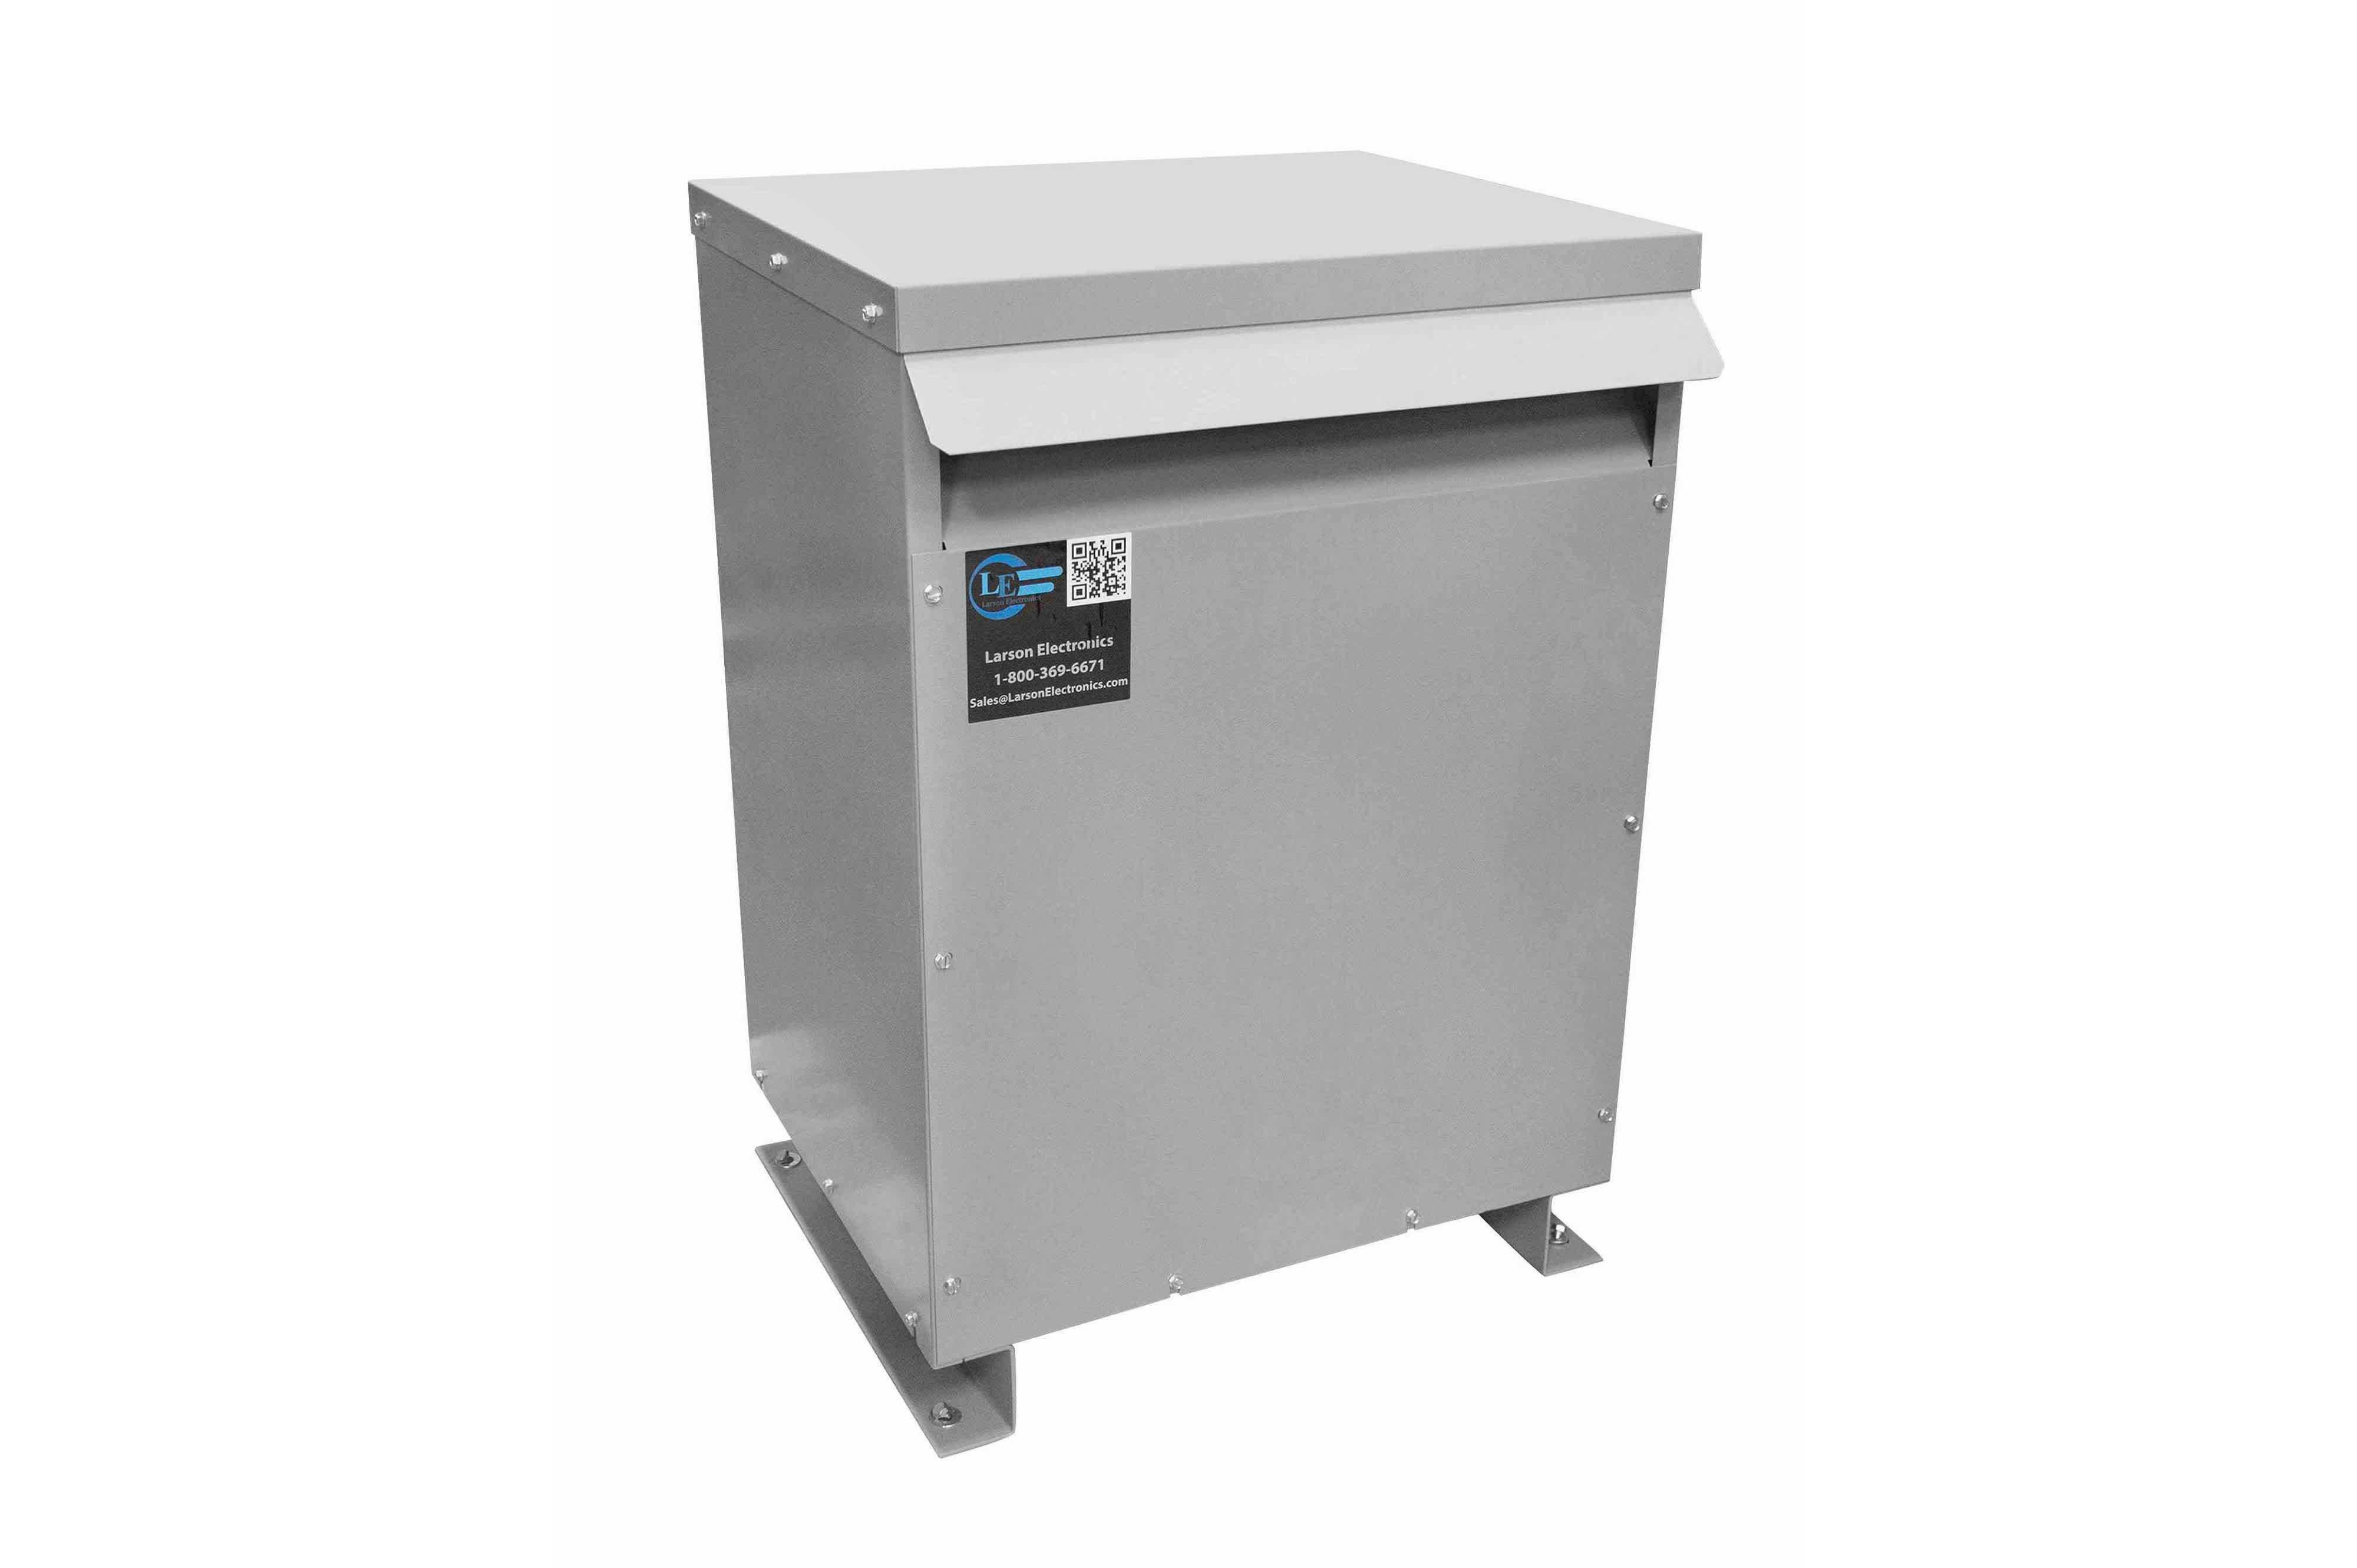 15 kVA 3PH Isolation Transformer, 400V Wye Primary, 600Y/347 Wye-N Secondary, N3R, Ventilated, 60 Hz